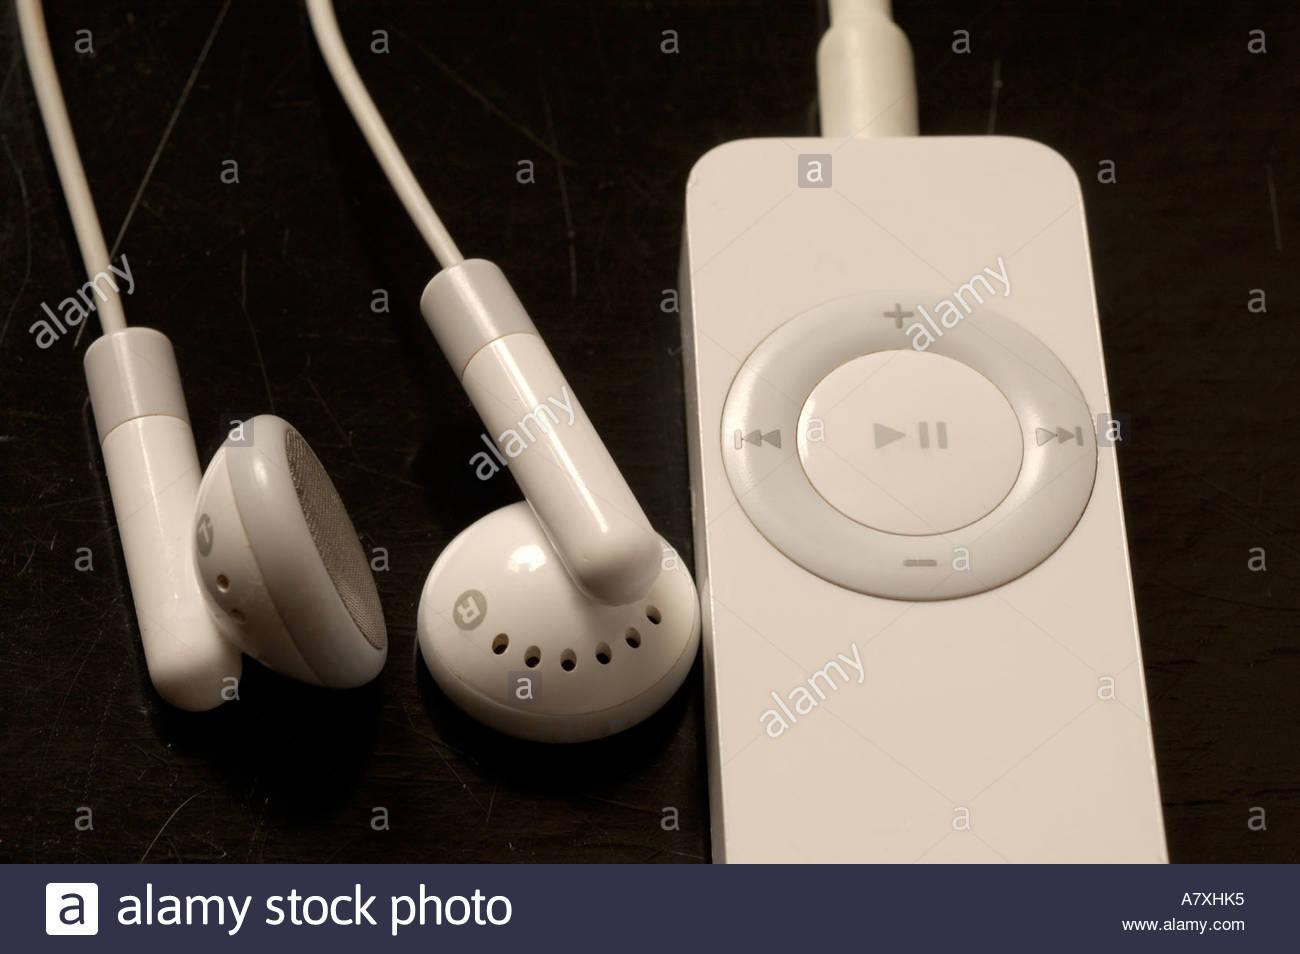 apple iPod shuffle at black background Stock Photo 6816500   Alamy 1300x954